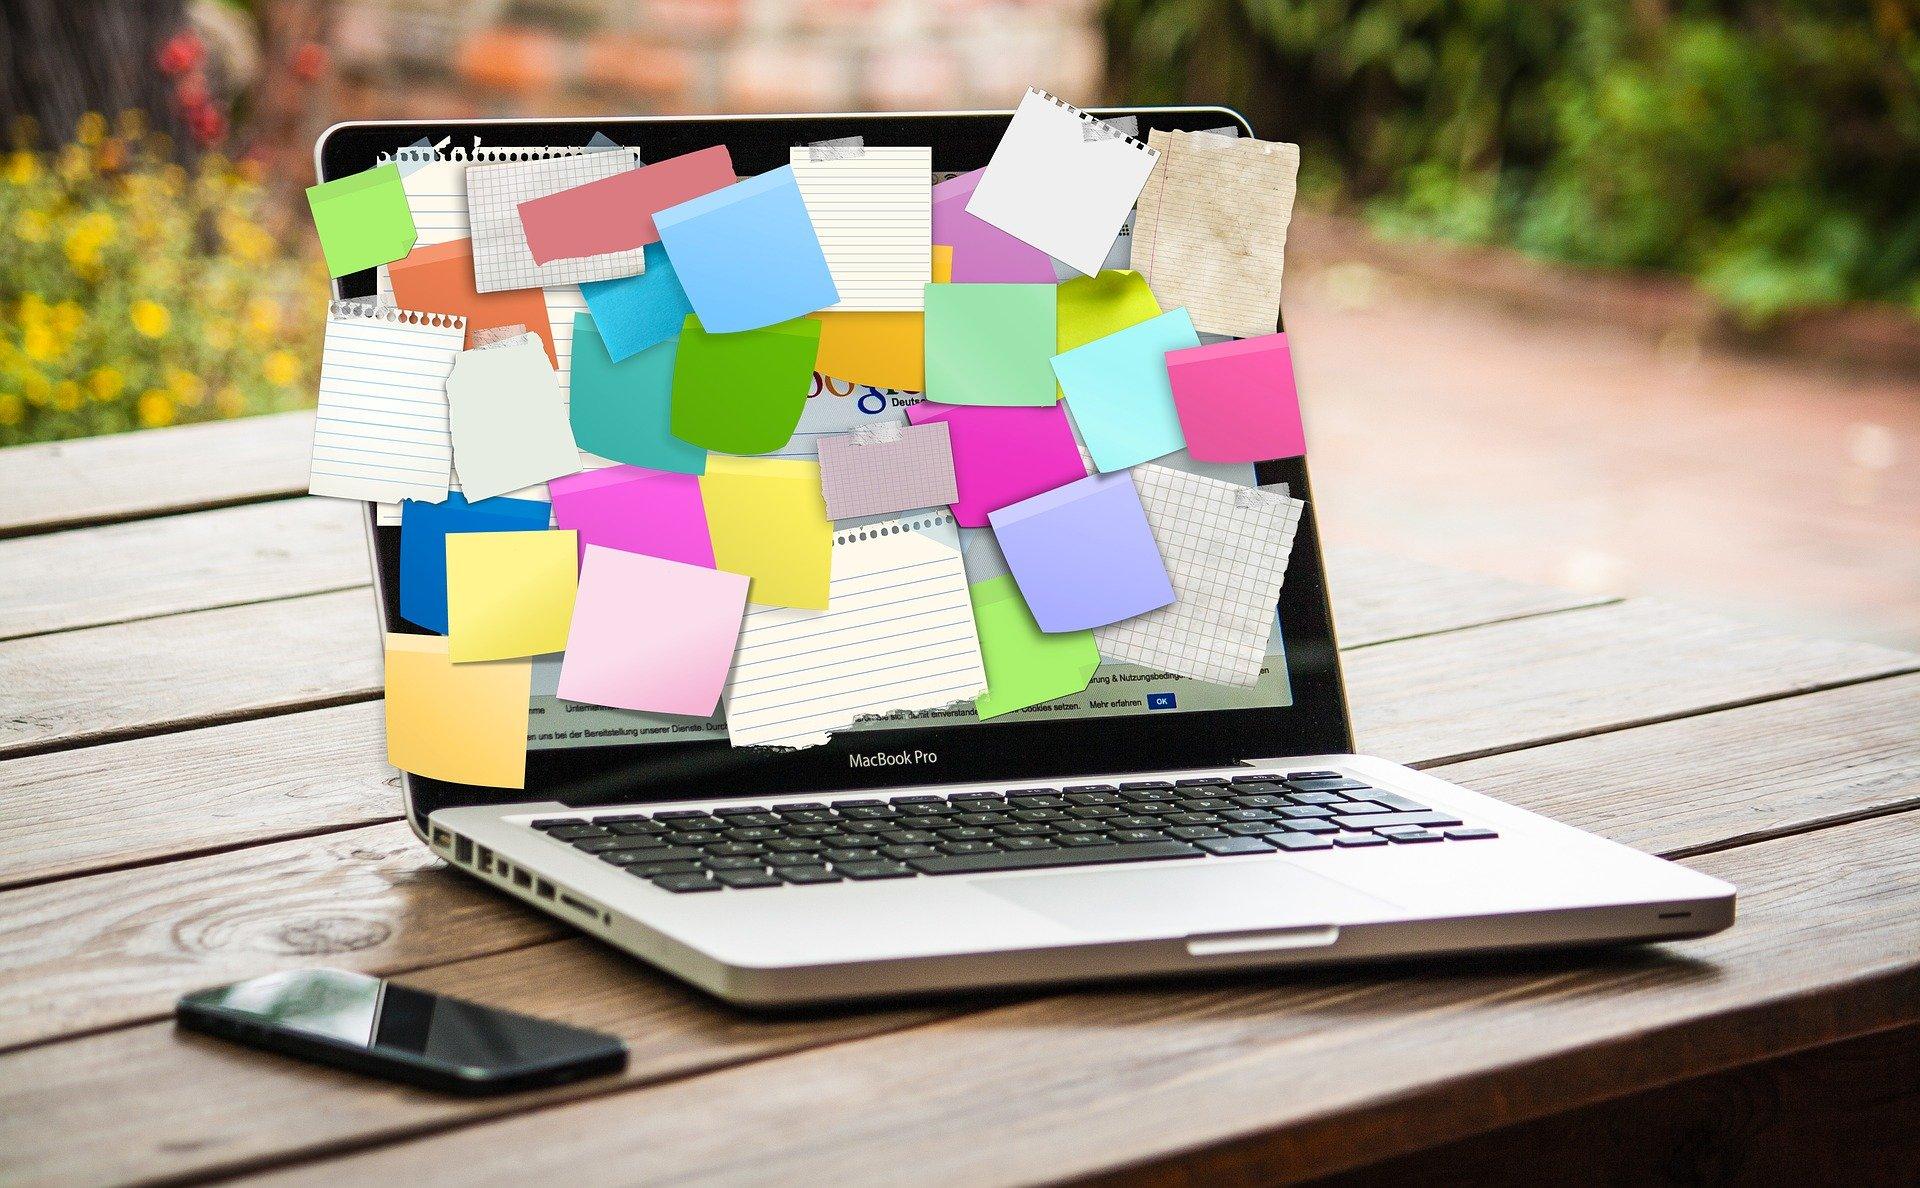 tipp-3-nerdweibweb-homeschooling-homeoffice-kalender-prioritäten